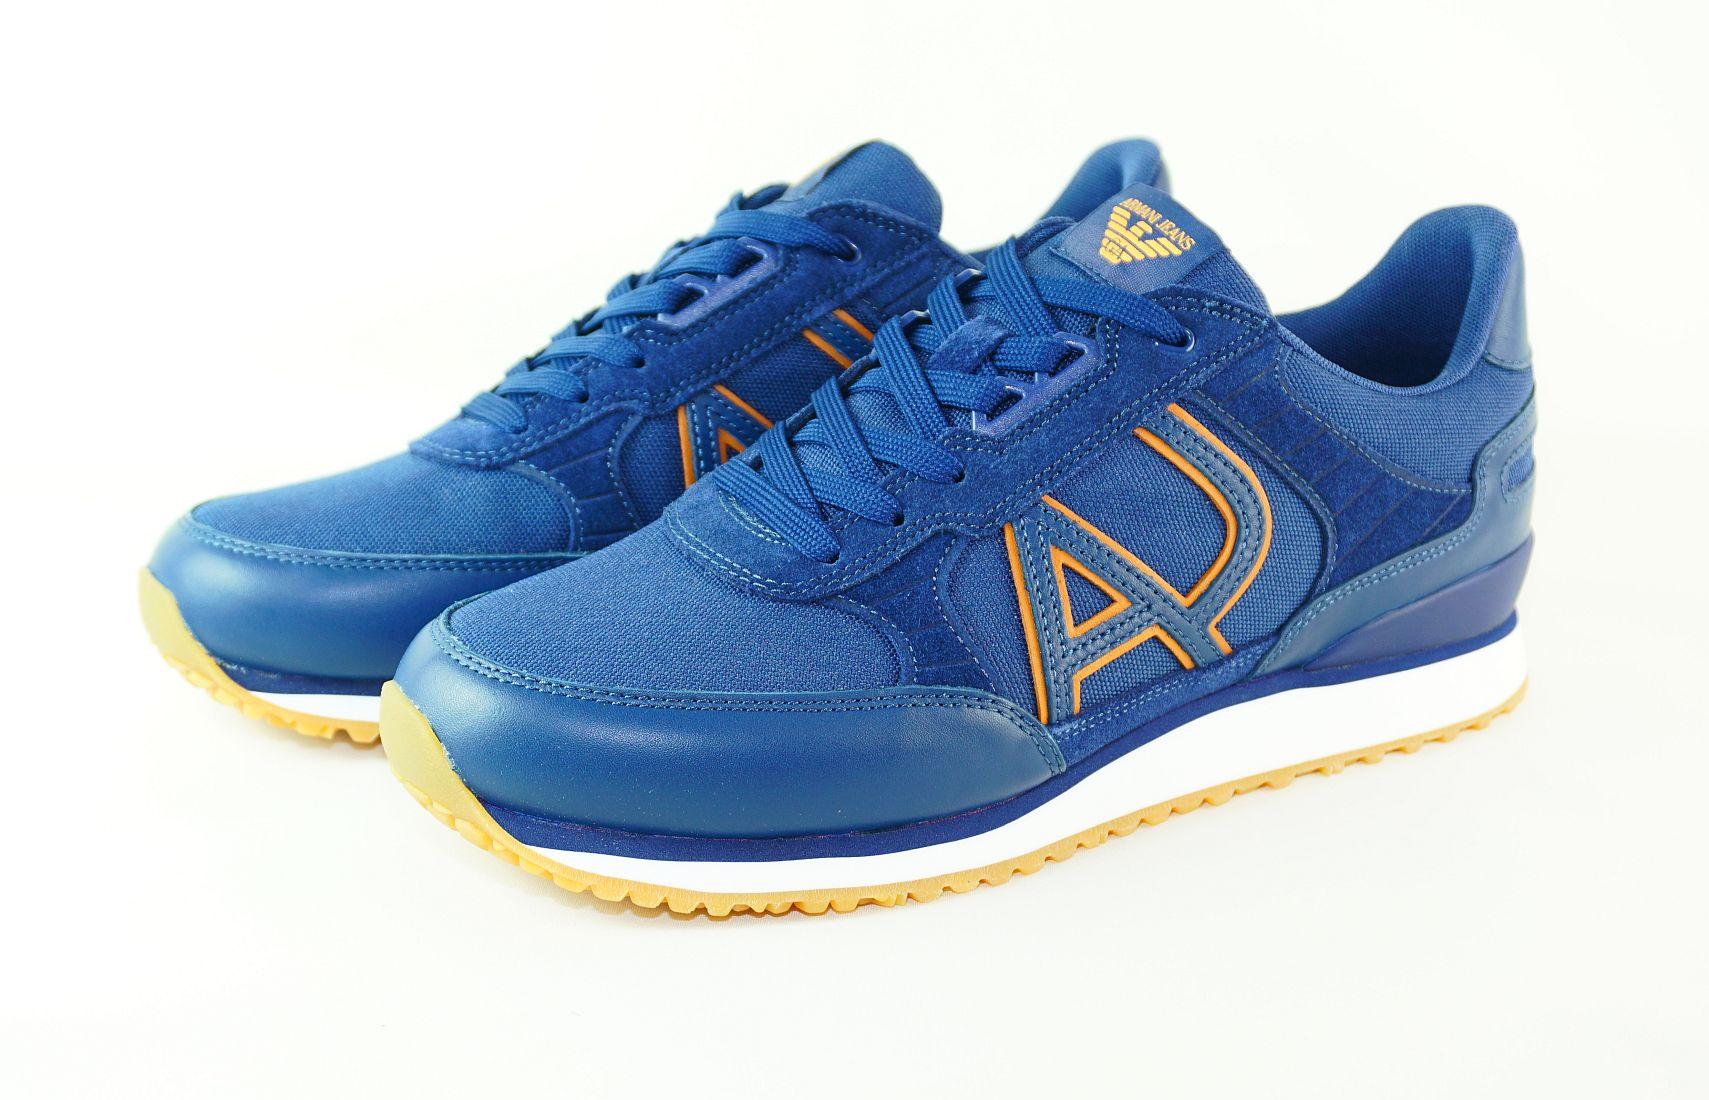 Armani Jeans Schnürschuhe SNEAKER LOW CUT 935028 7P424 40835 Blue blau S17-AJS1